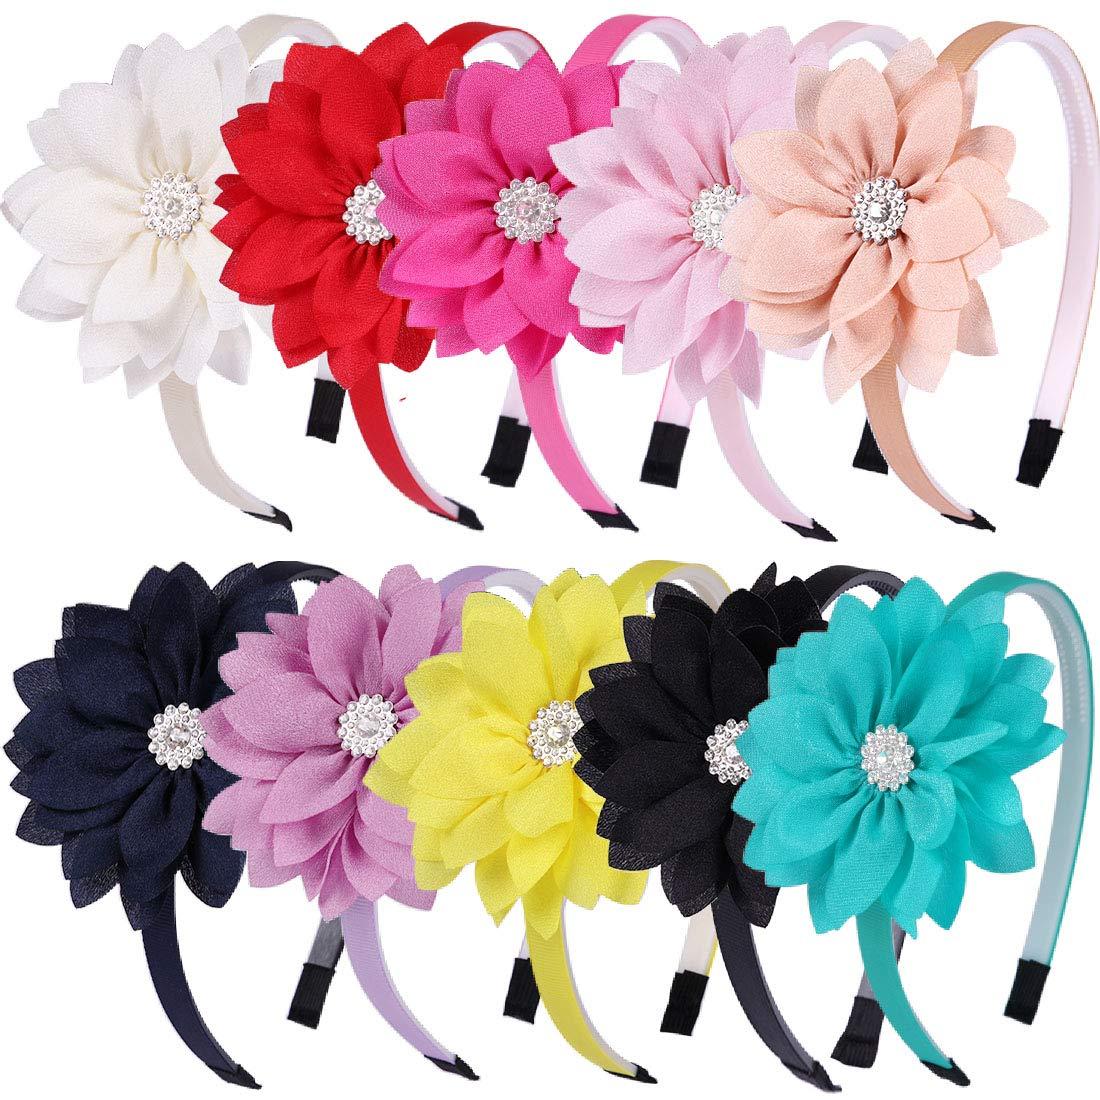 Big Bows Headband Grosgrain Ribbon Children Bow Headbands Little Girl Flower Sweet Kids Head Hoop-10 colors